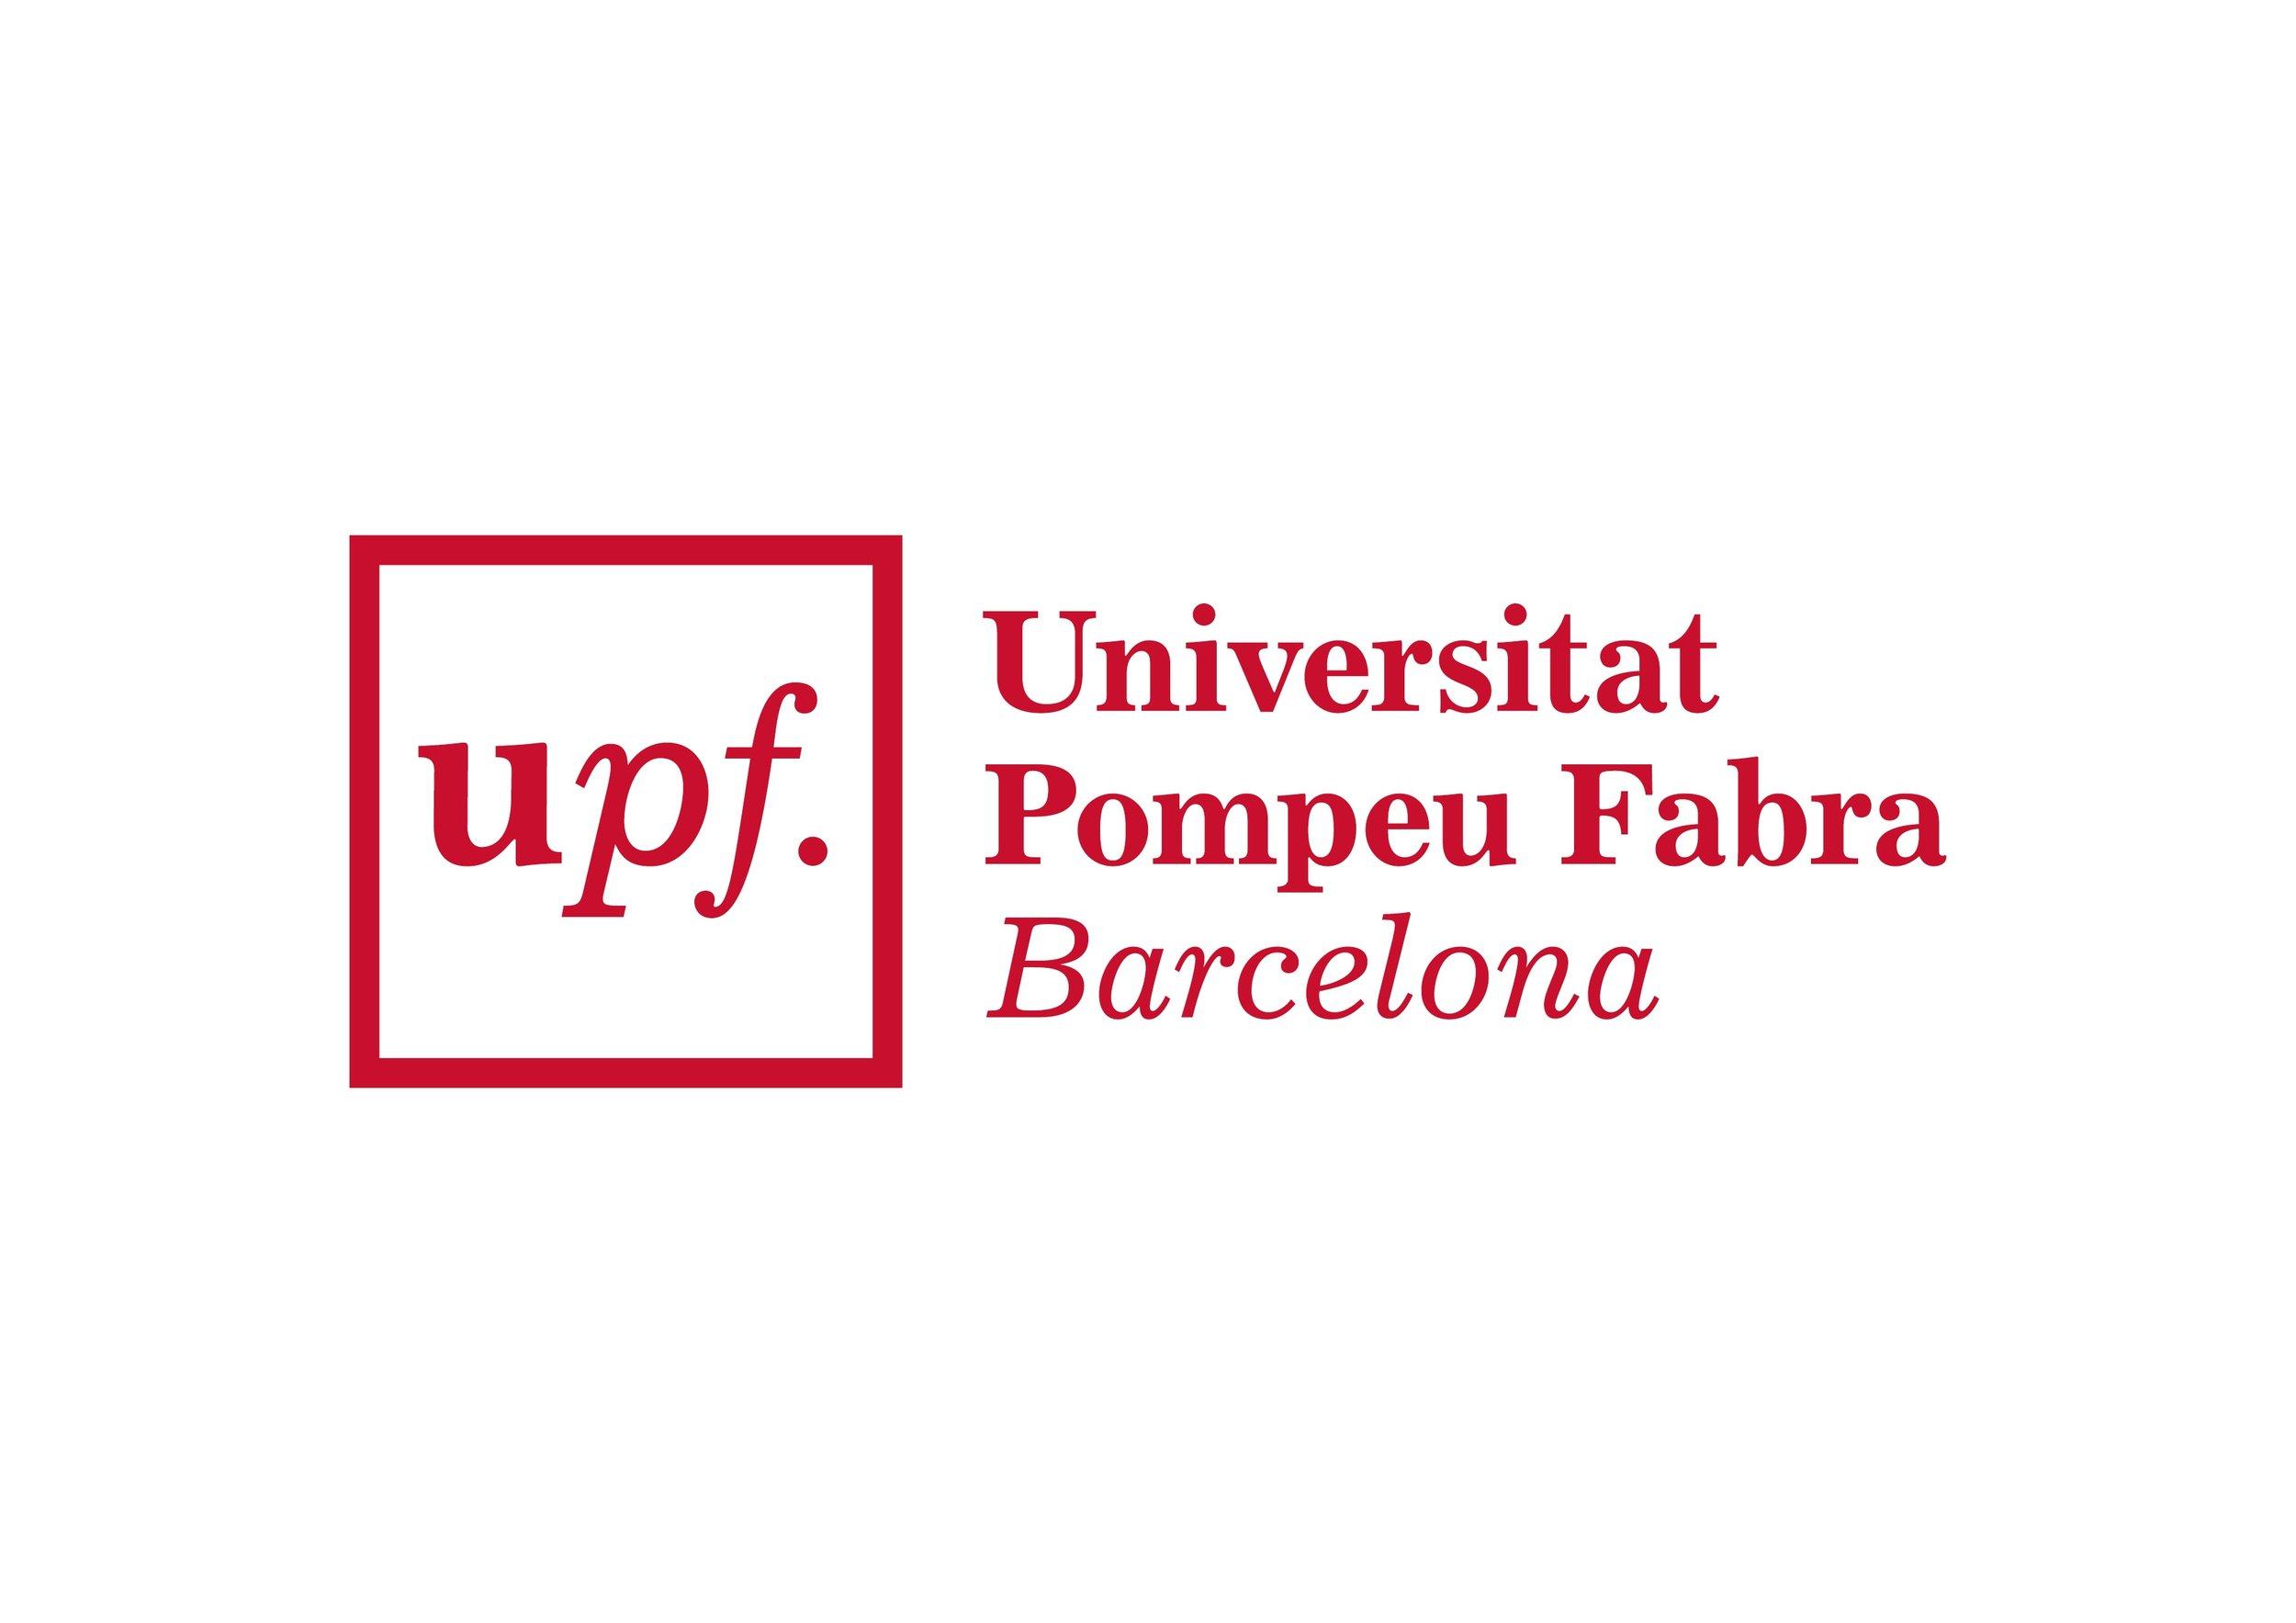 Universitat-Pompeu-Fabra.jpg